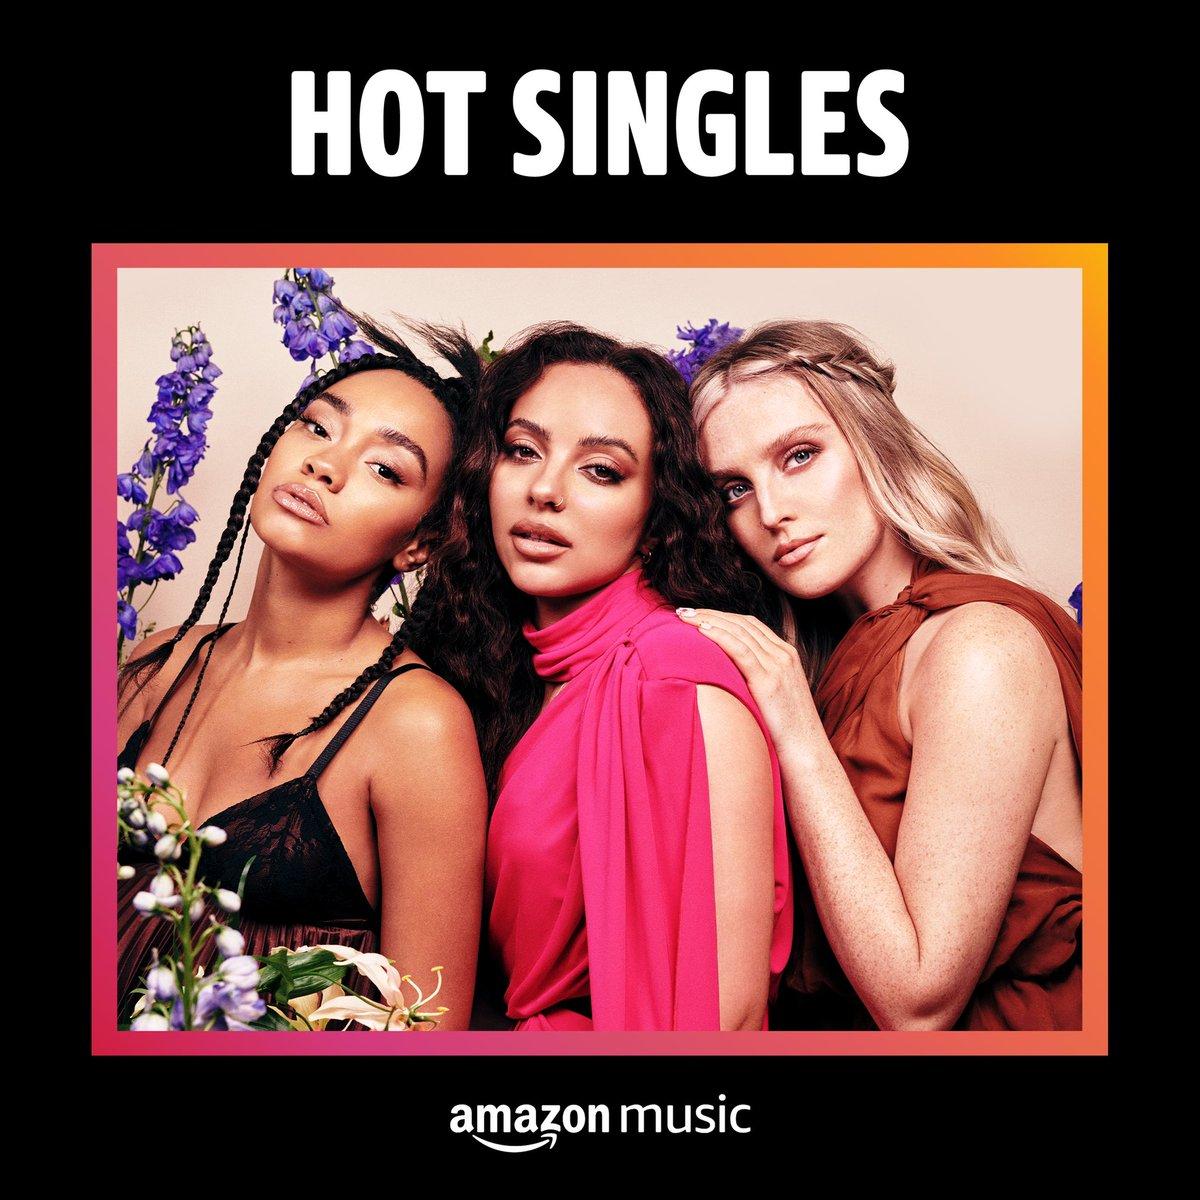 On the cover of Hot Singles 💐 Thank you @AmazonMusicUK https://t.co/v6lFYvBr2I https://t.co/JMYtS2JTsZ